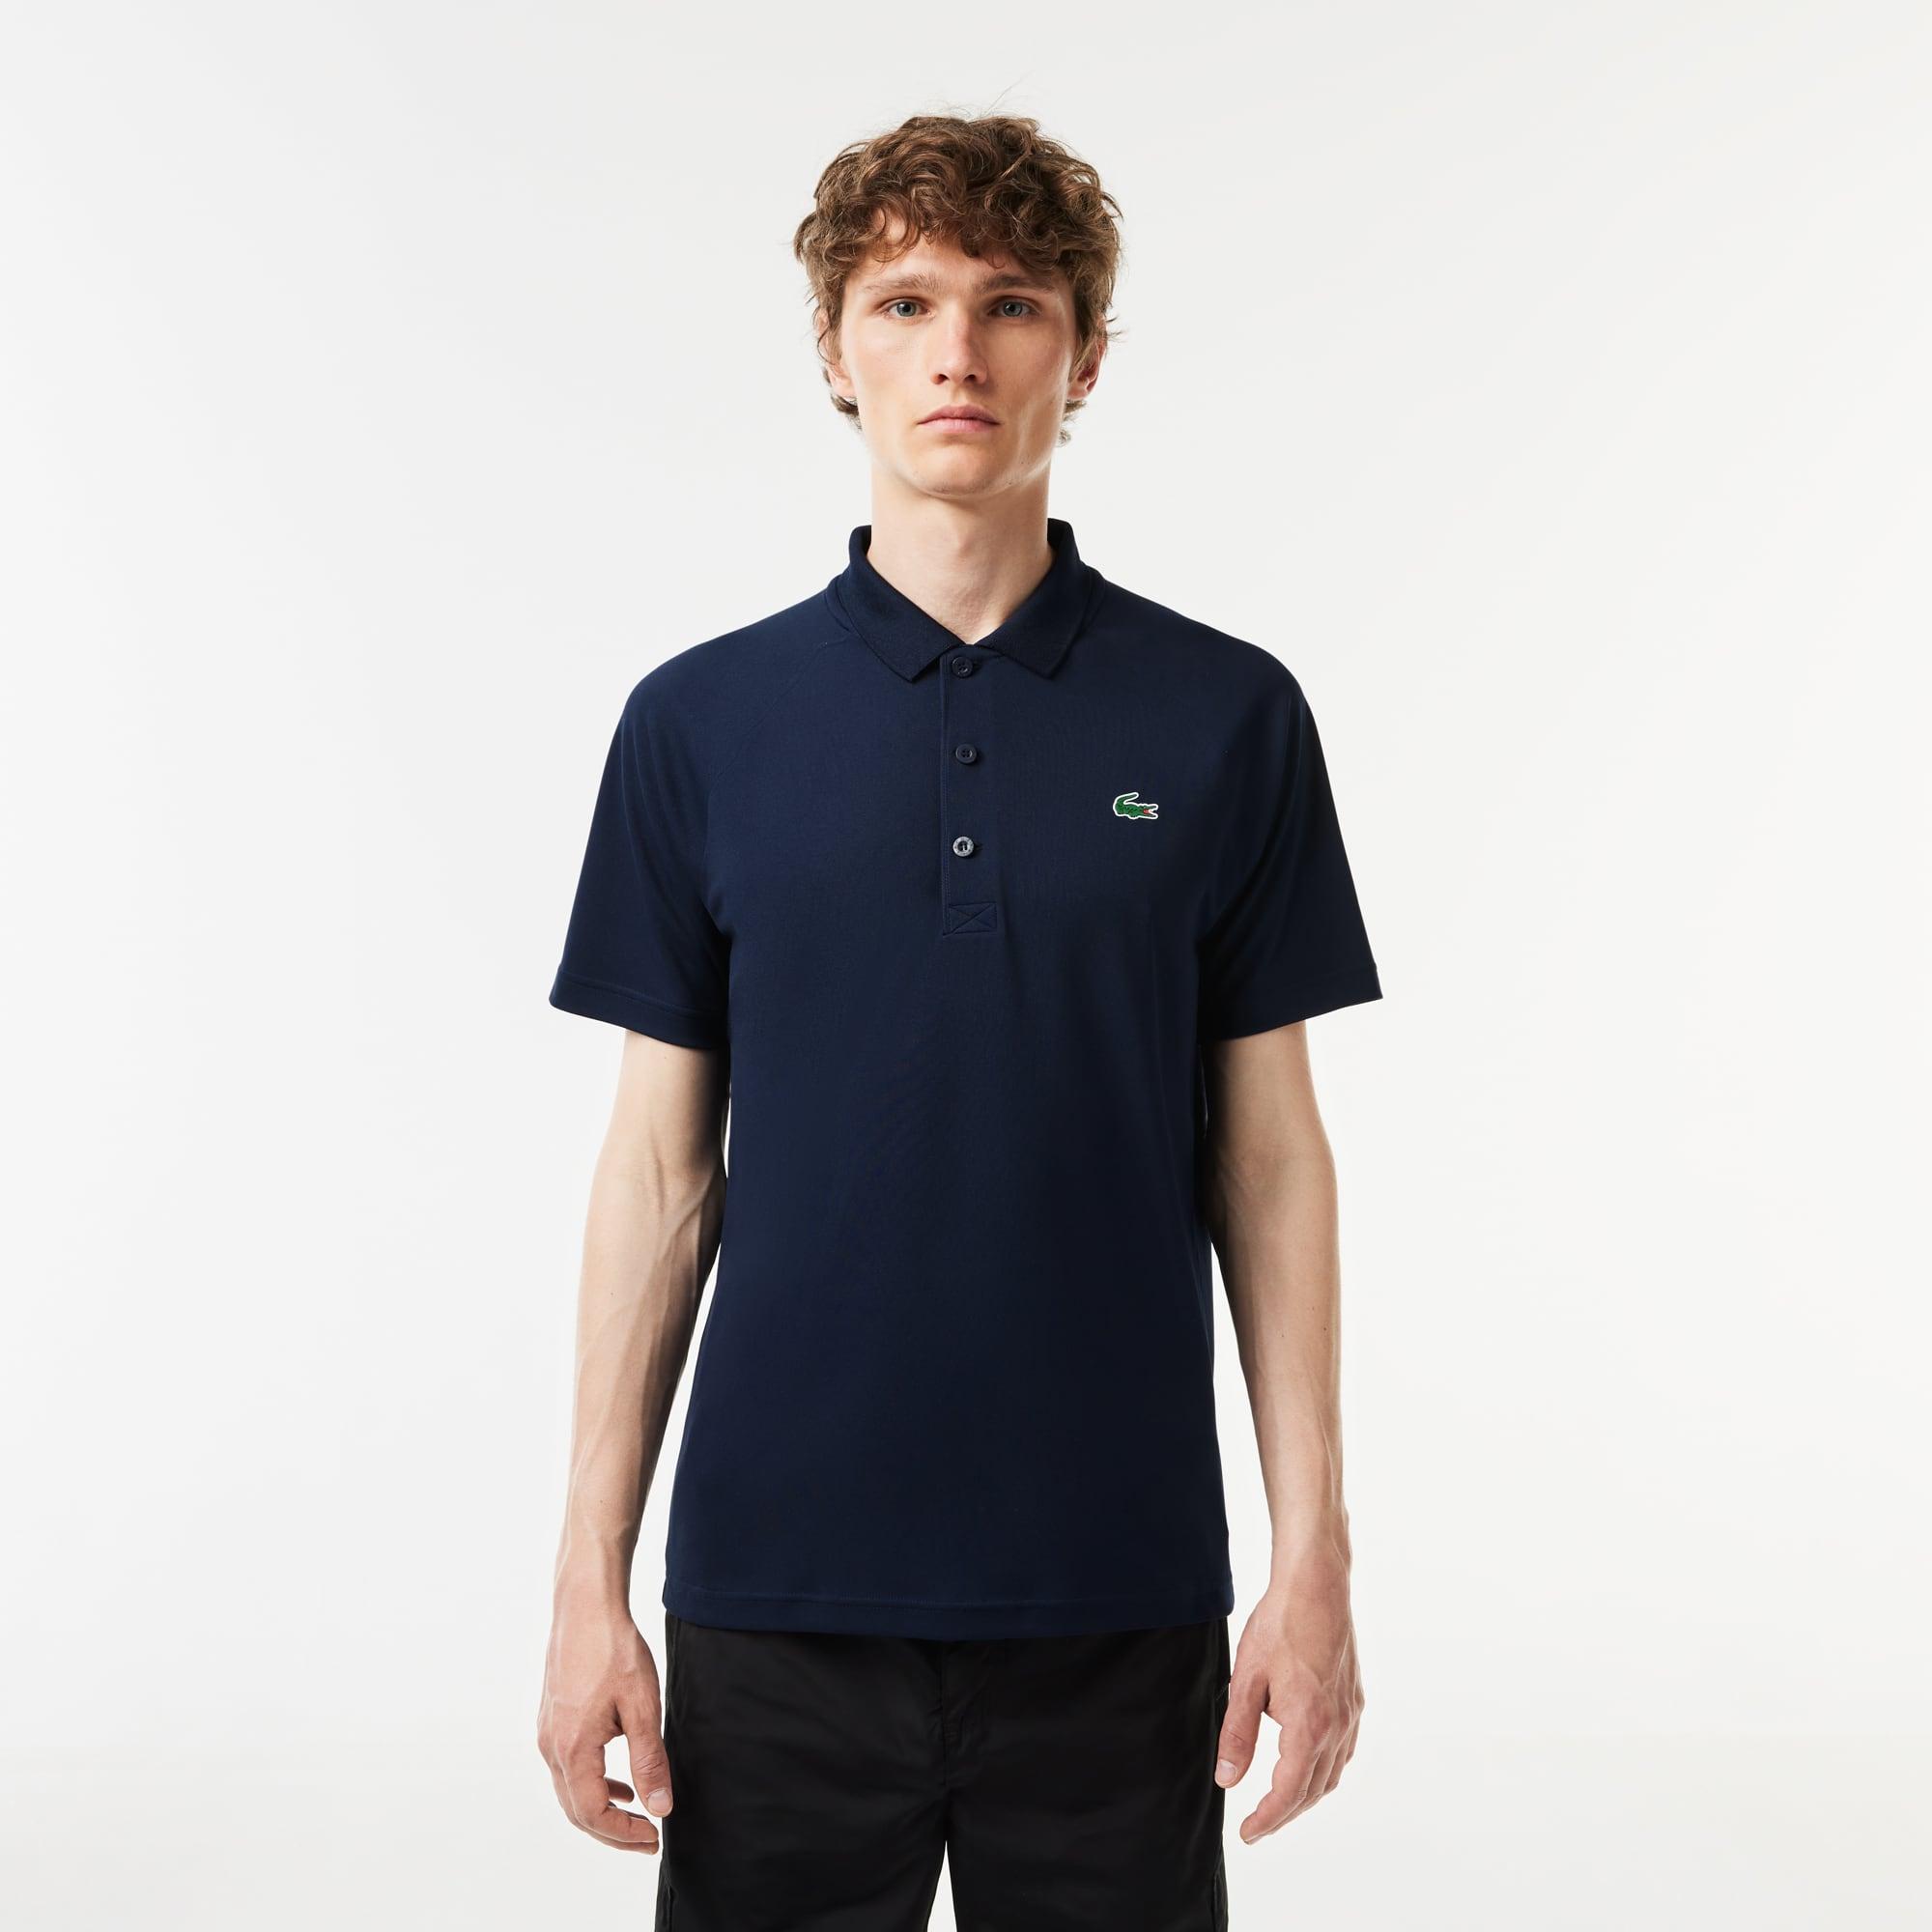 Lacoste Mens SPORT Breathable Run-Resistant Interlock Polo Shirt